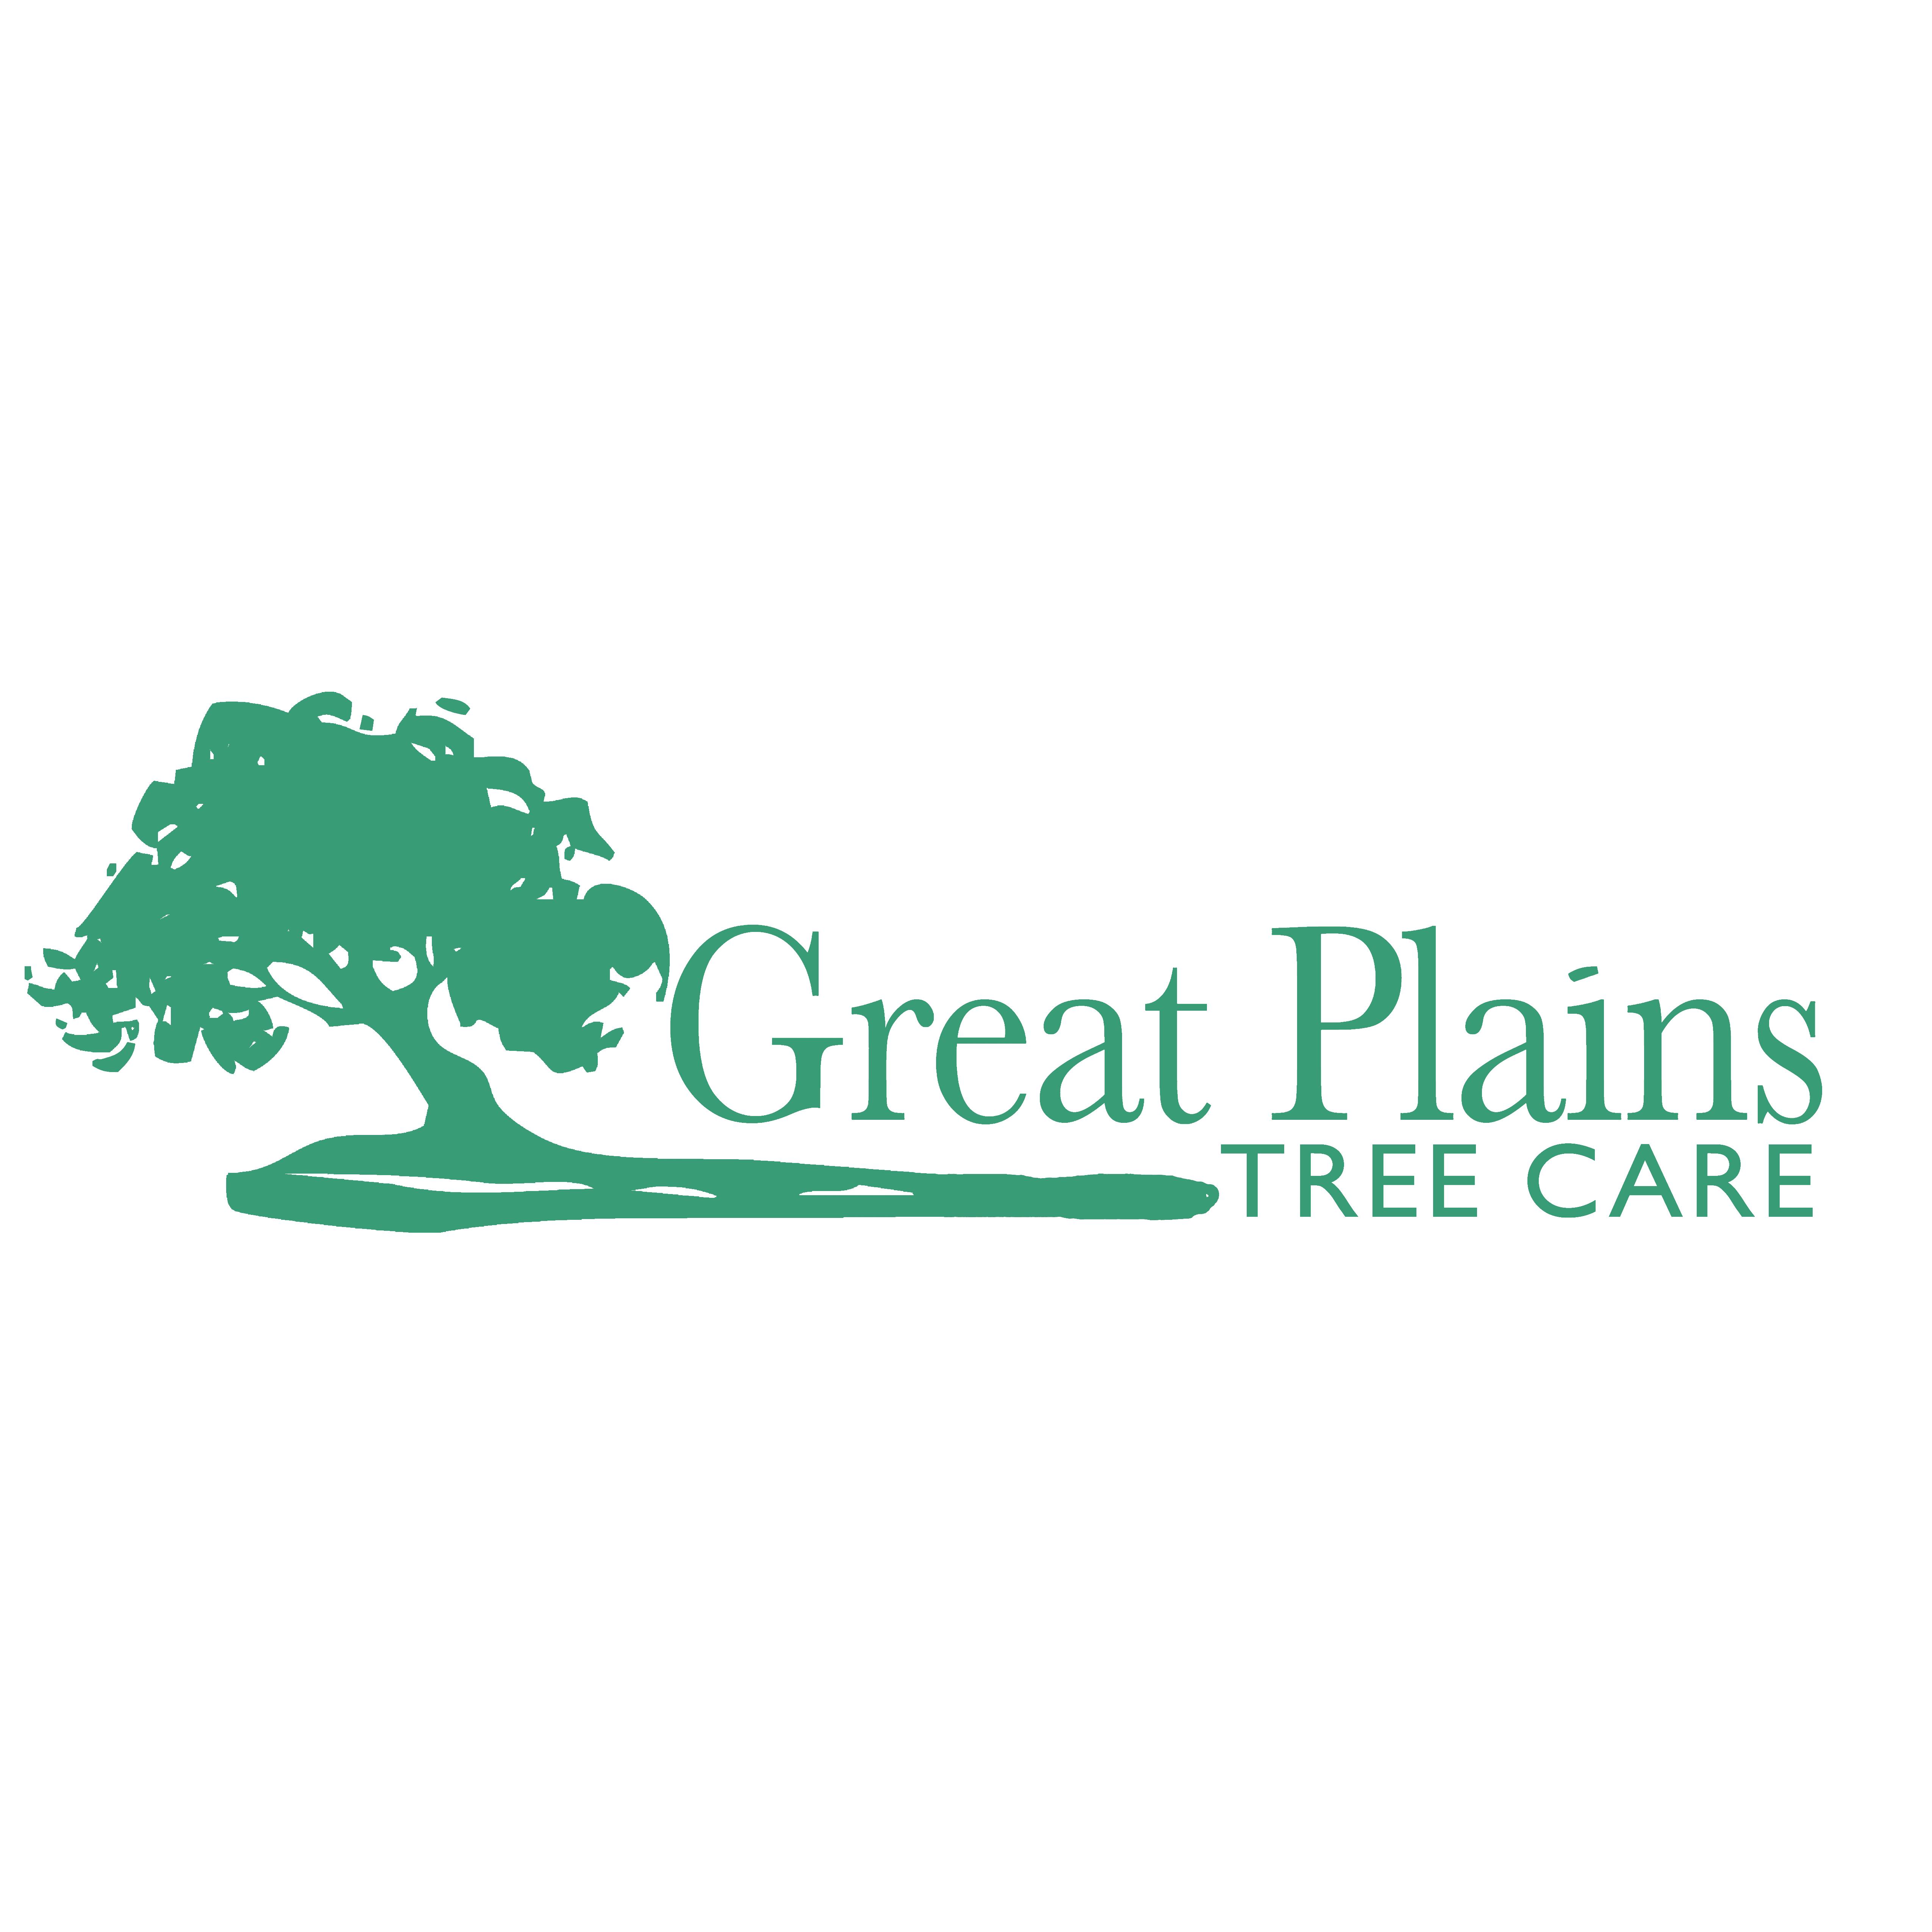 Great Plains Tree Care - Omaha, NE - Tree Services